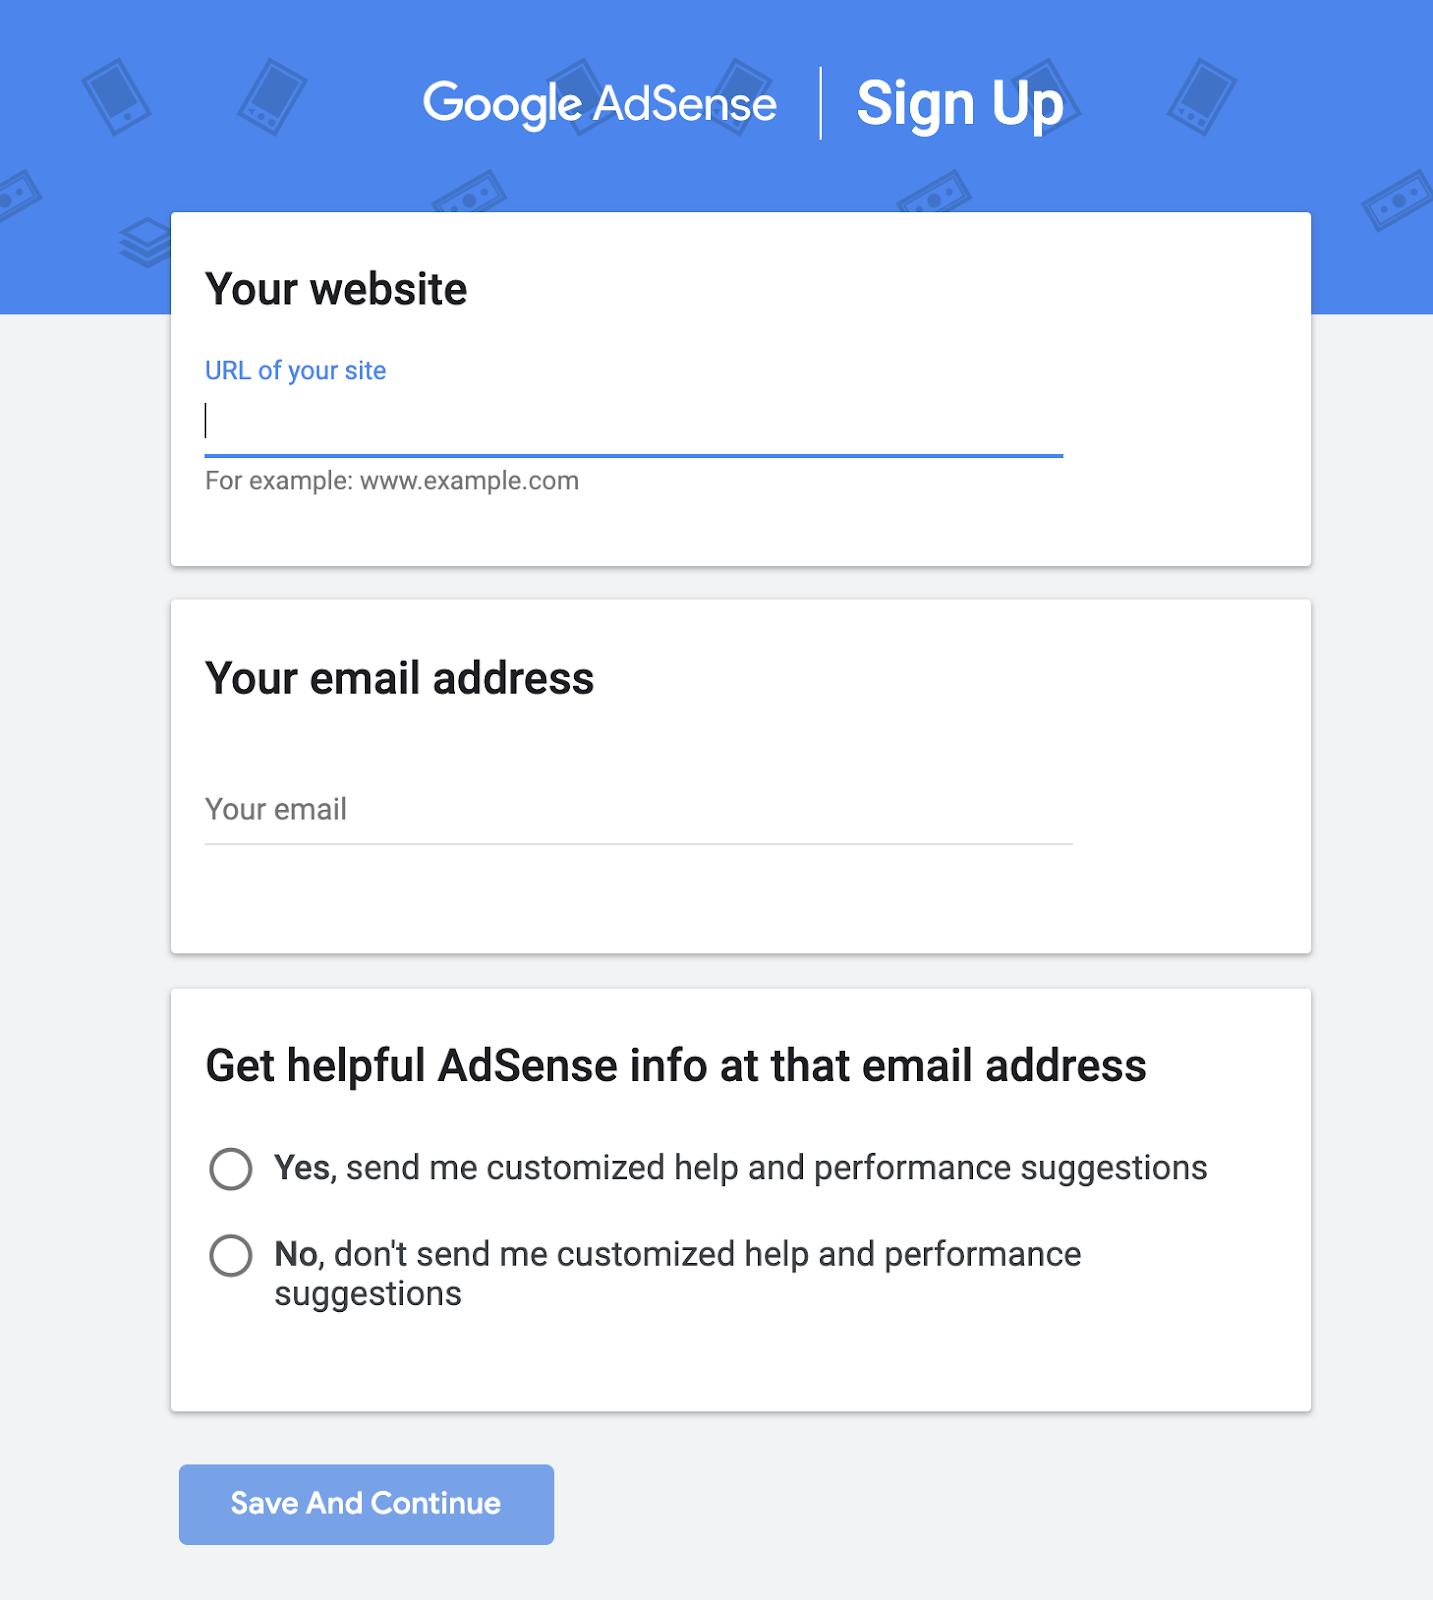 Screenshot of Sign up Form for Google AdSense Network